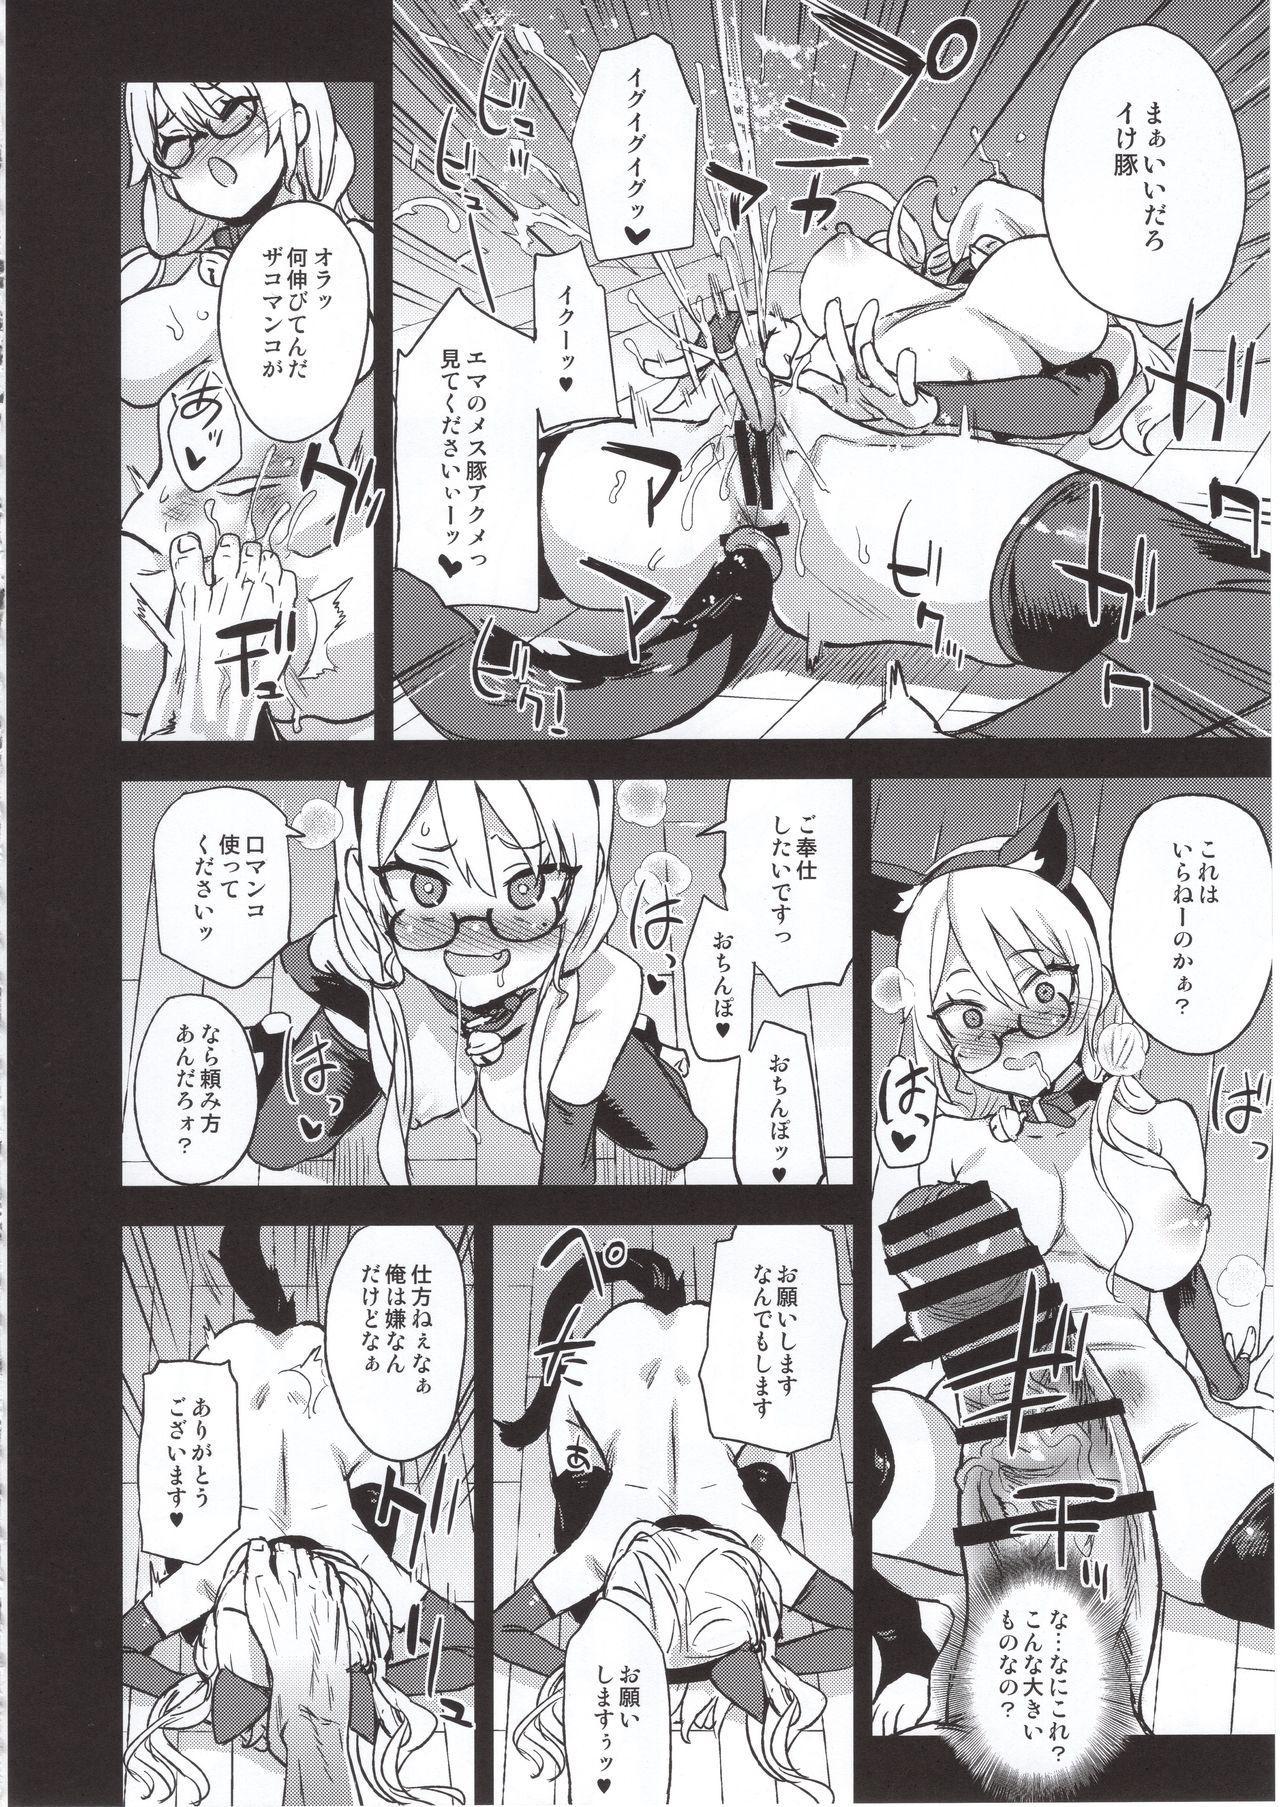 VictimGirlsR Watashi wa, Makemasen! 8